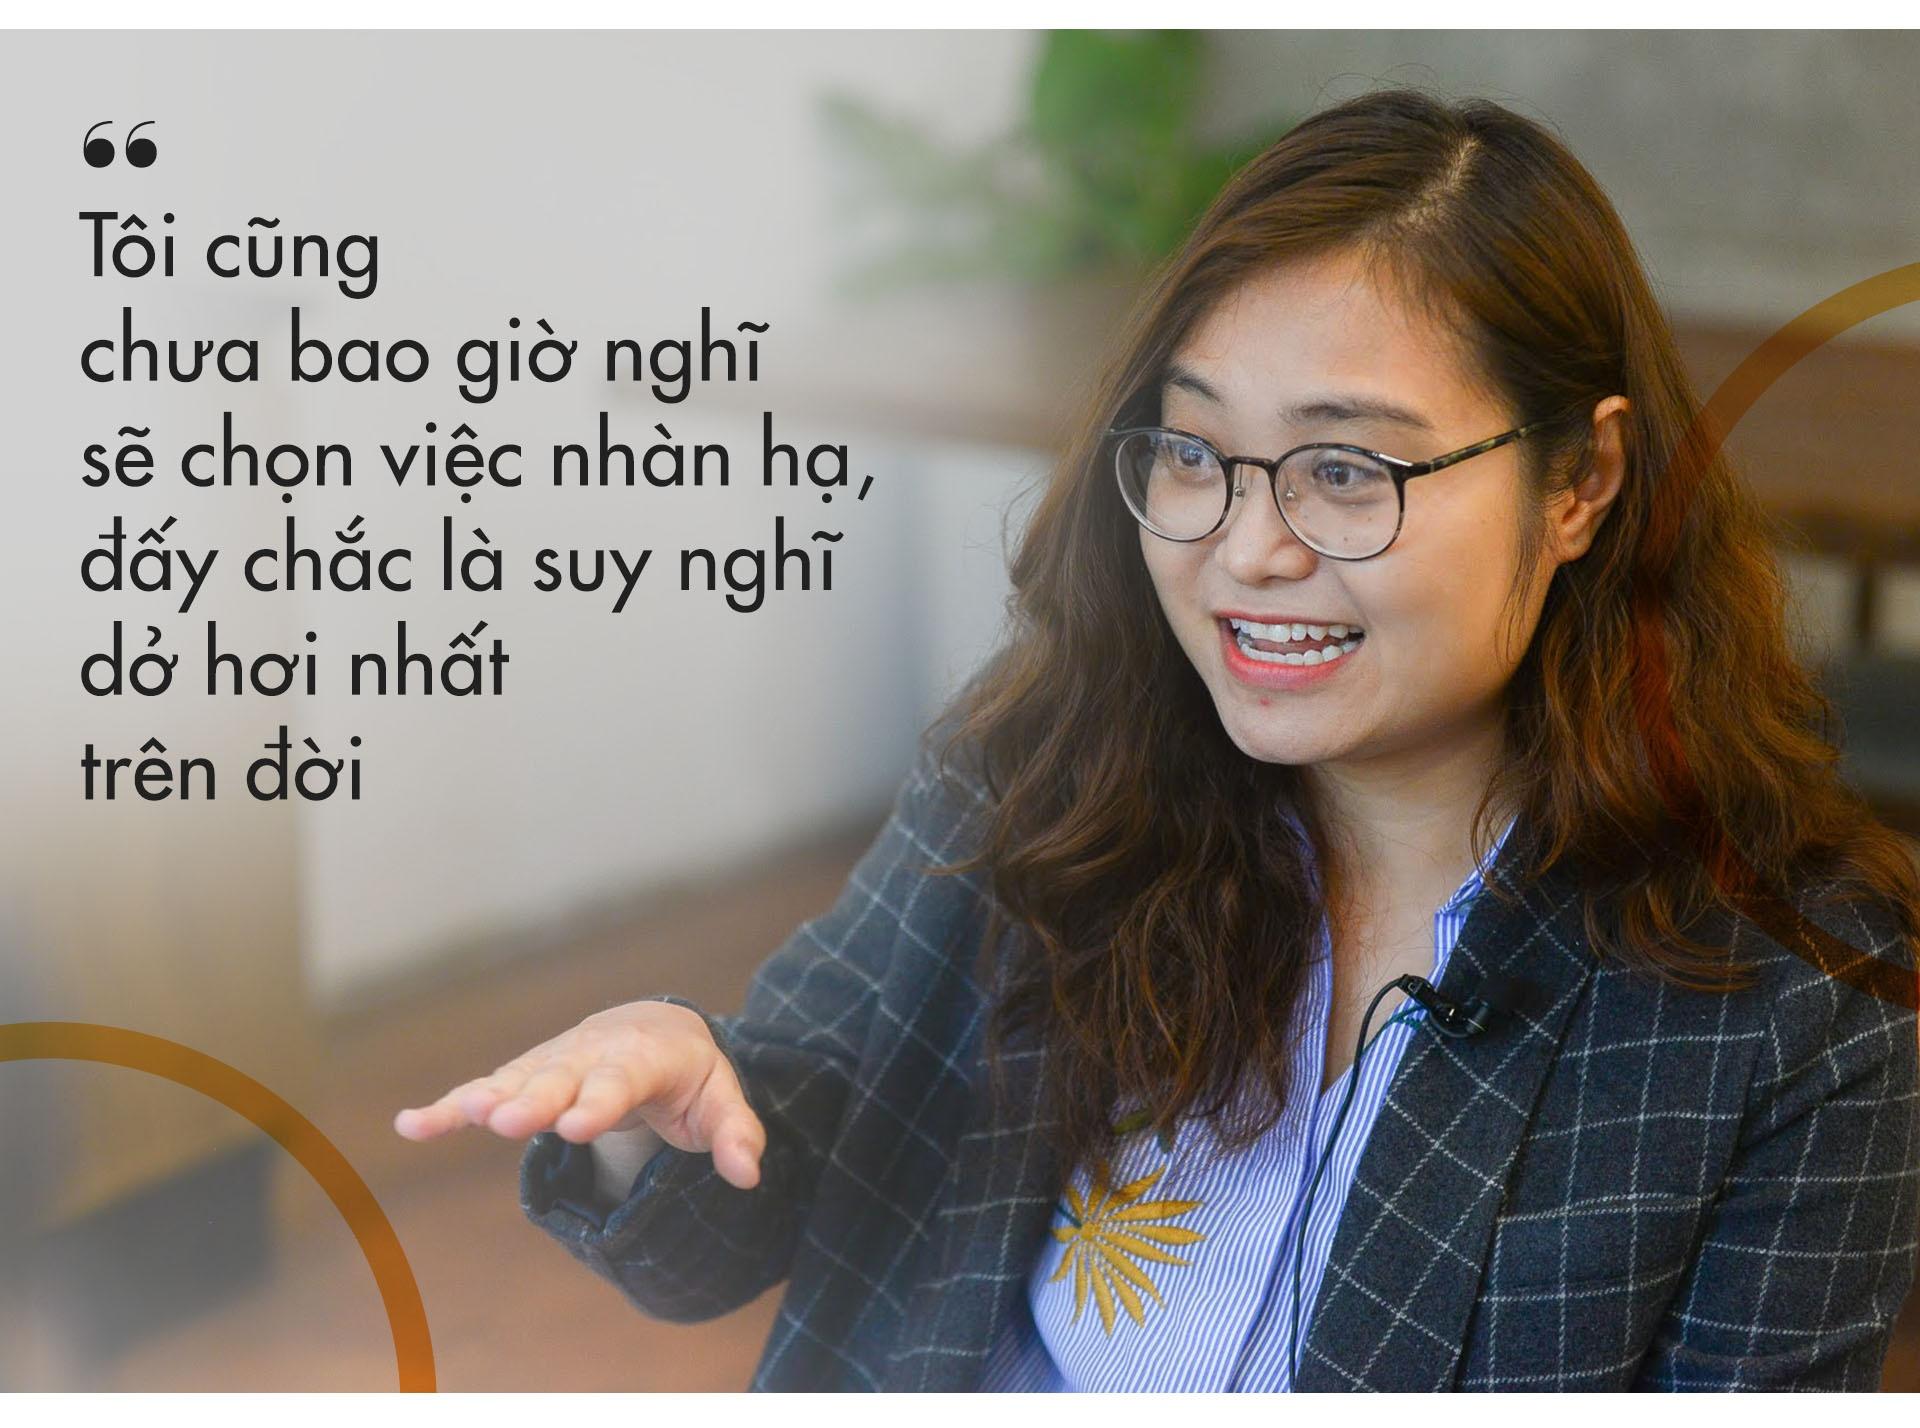 Cong chuc 'la' 8X duoc Forbes vinh danh: 'Dung lam viec chi vi tien' hinh anh 13